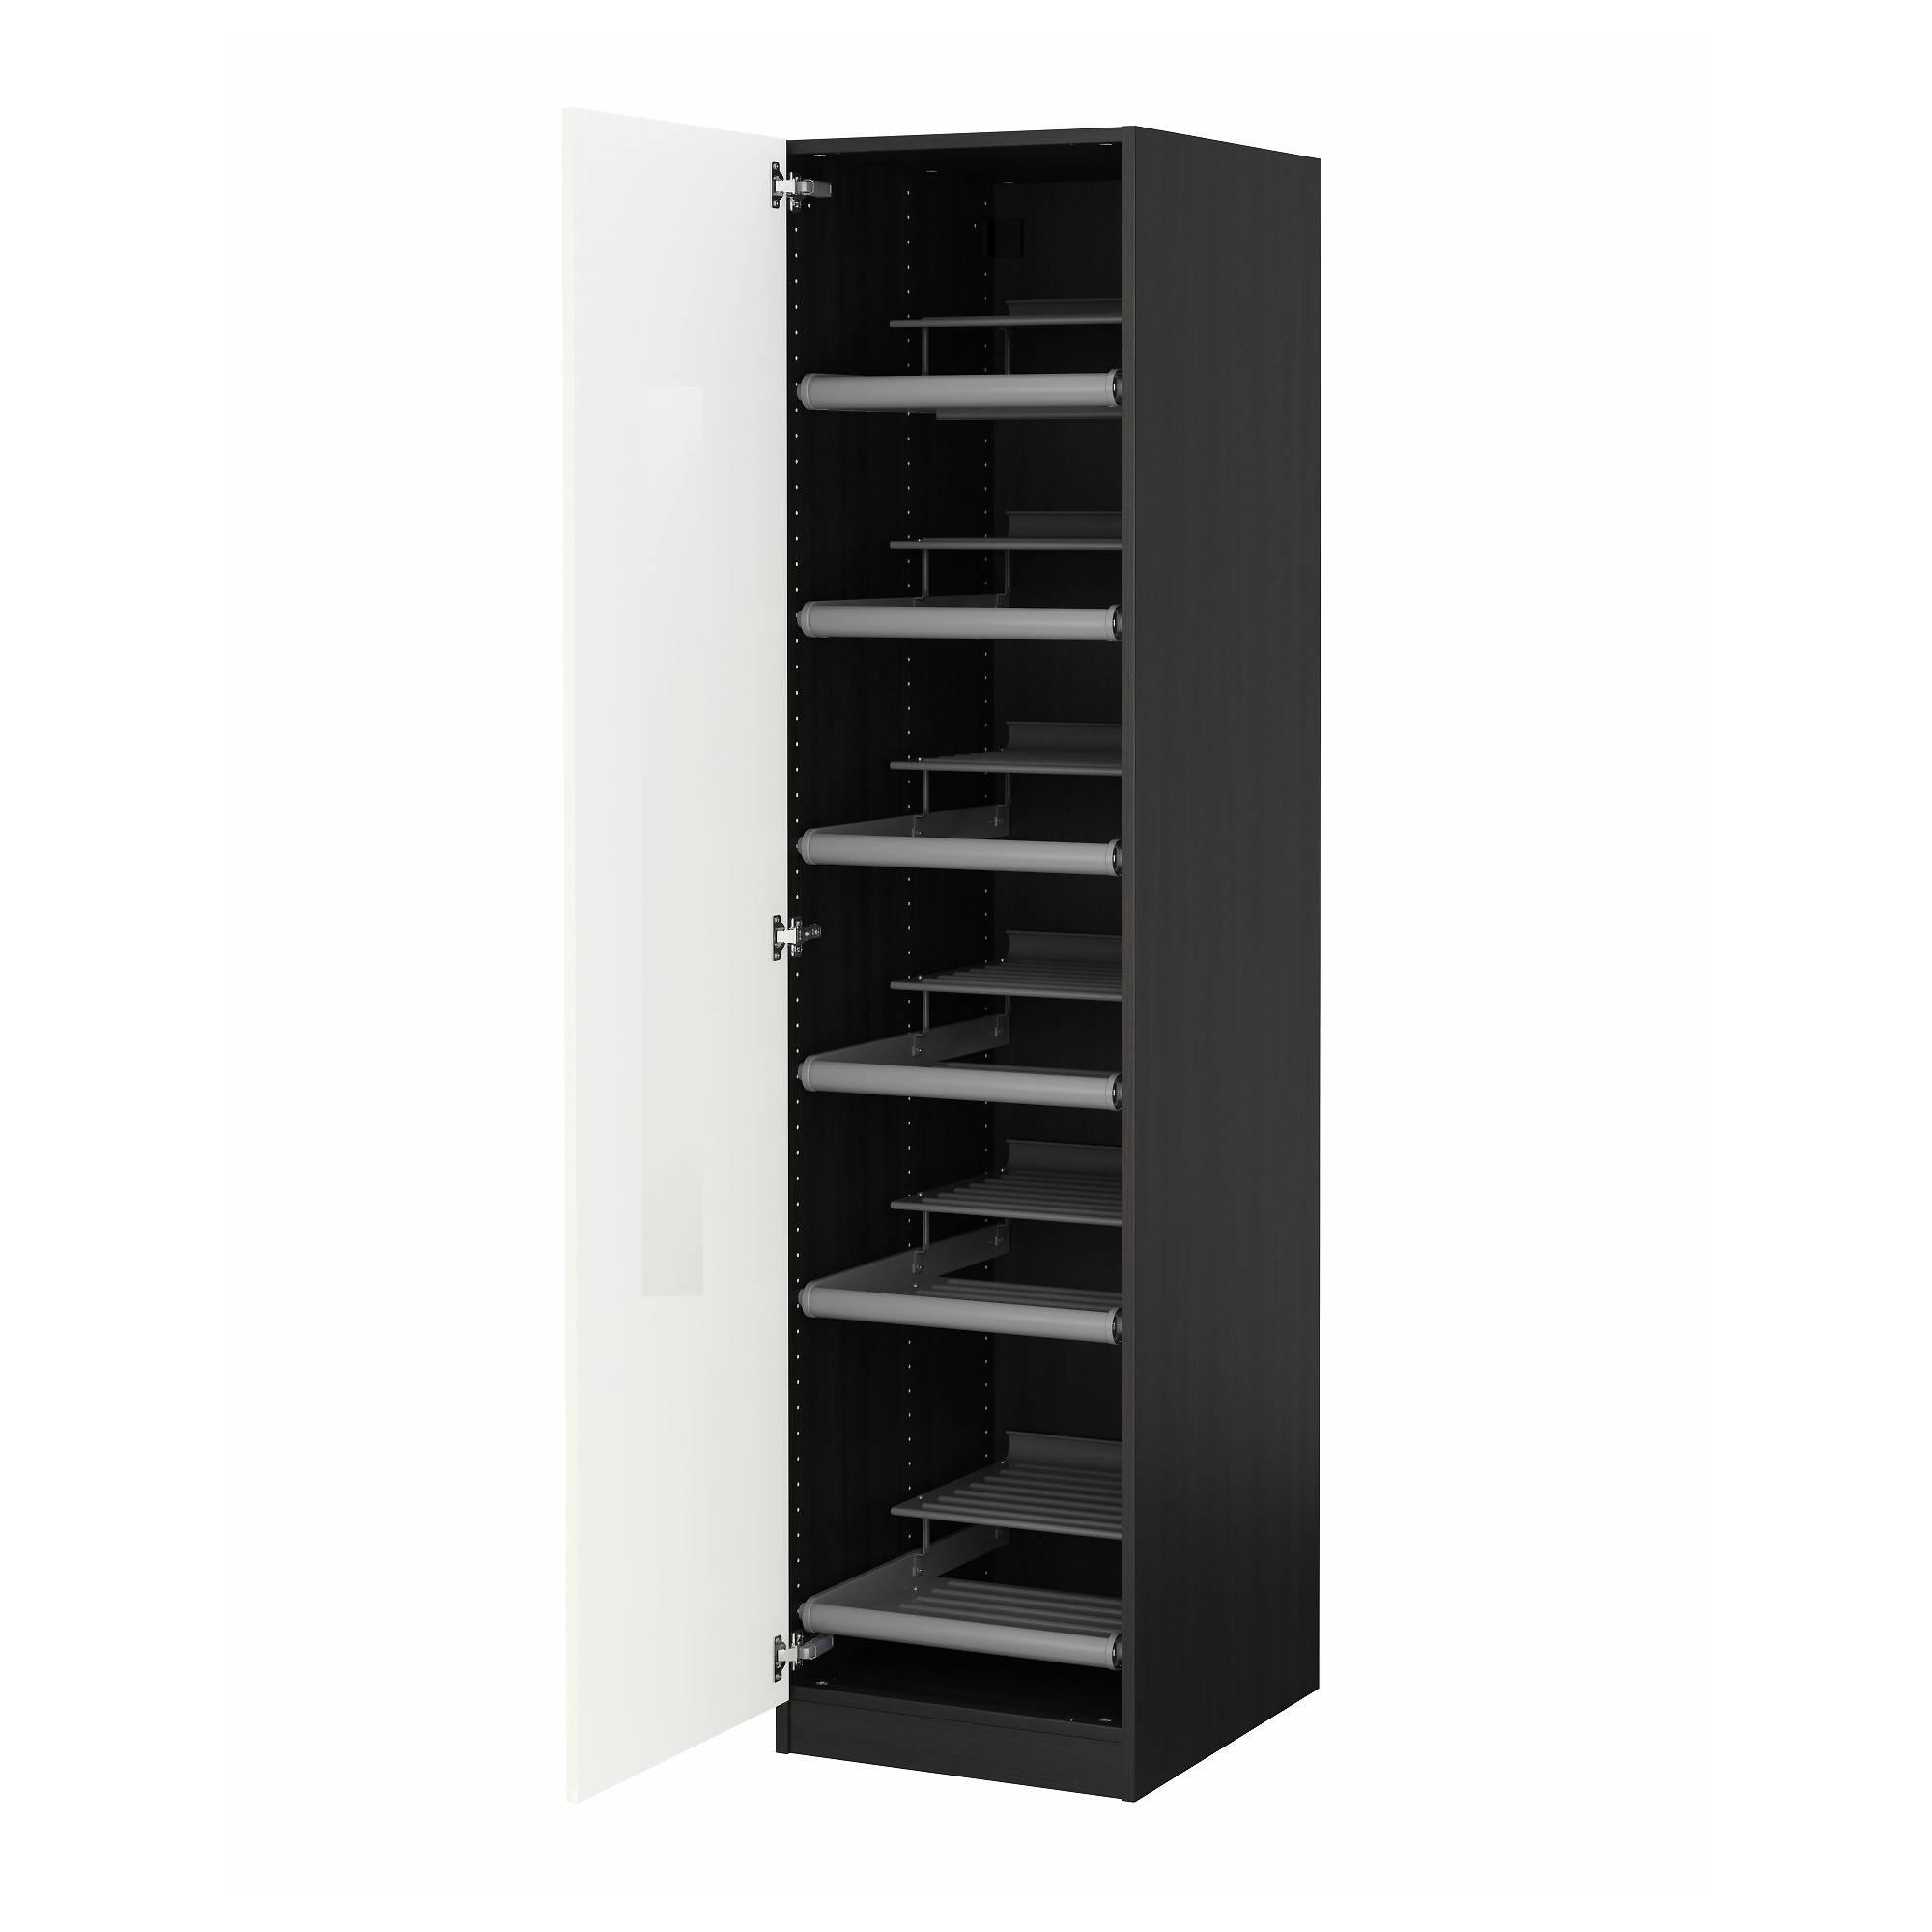 Pax Wardrobe Black-Brown/ballstad White 50X60X201 Cm - Ikea throughout Brown Wardrobes (Image 8 of 15)